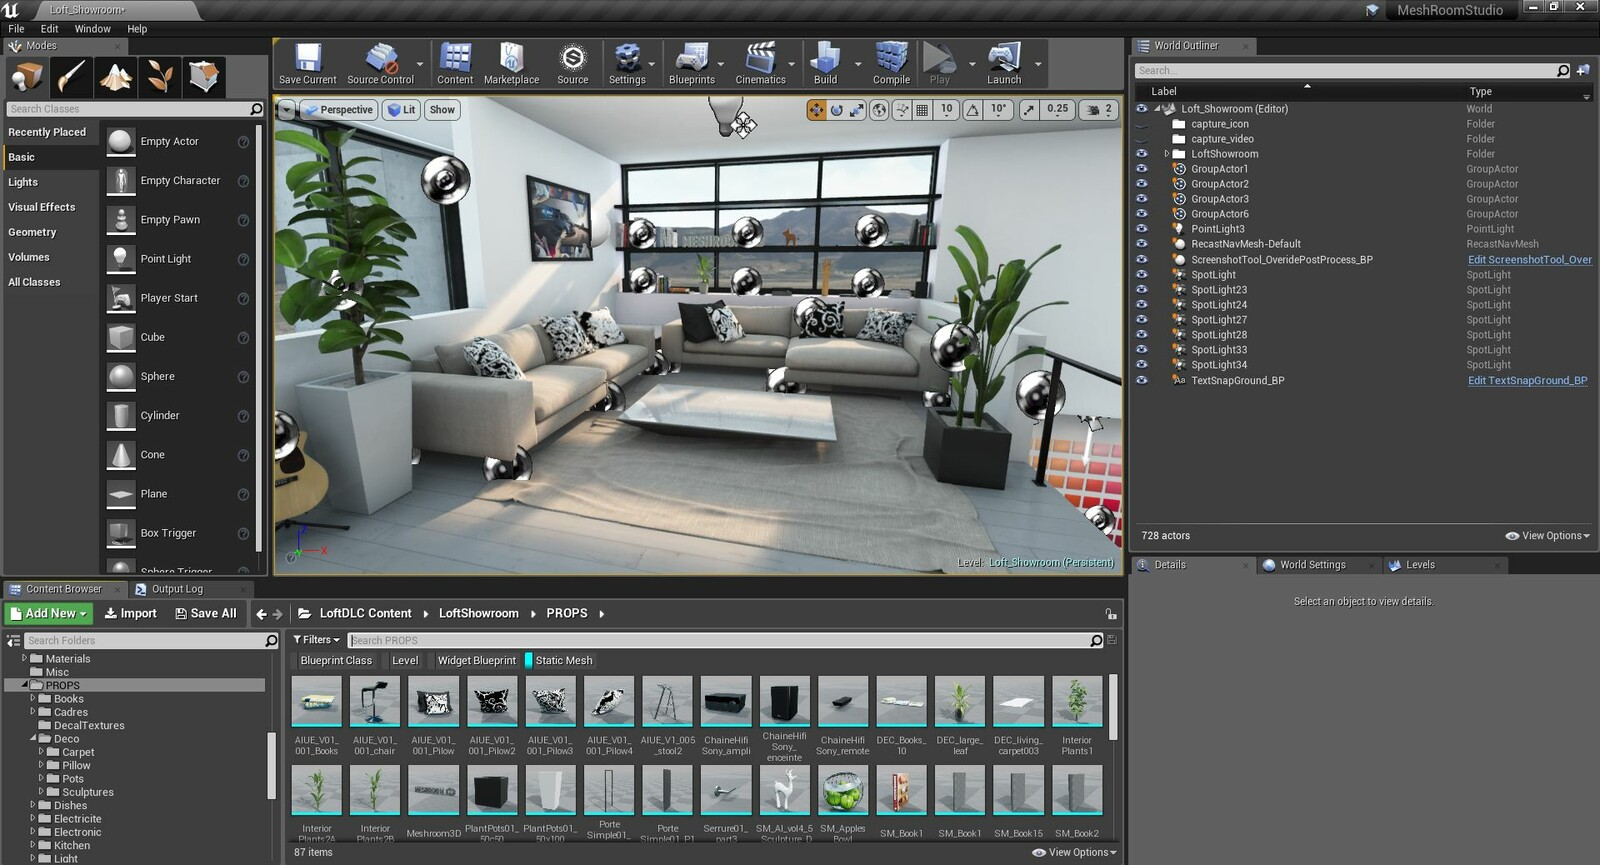 MeshroomStudio_LoftEnvironment 2018 - Production